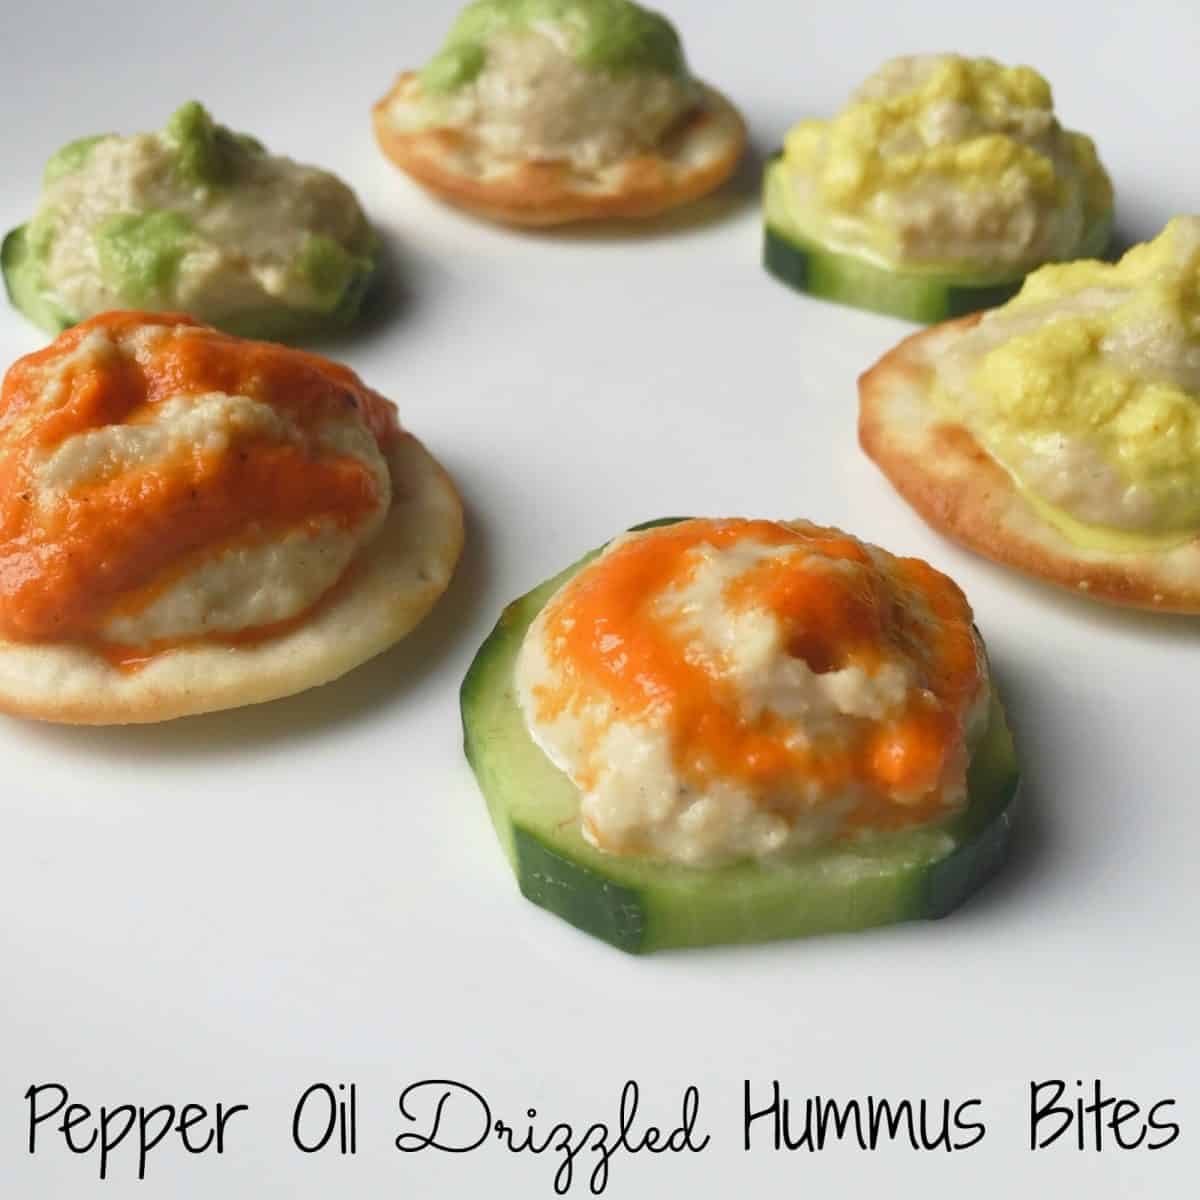 Pepper Oil Drizzled Hummus Bites